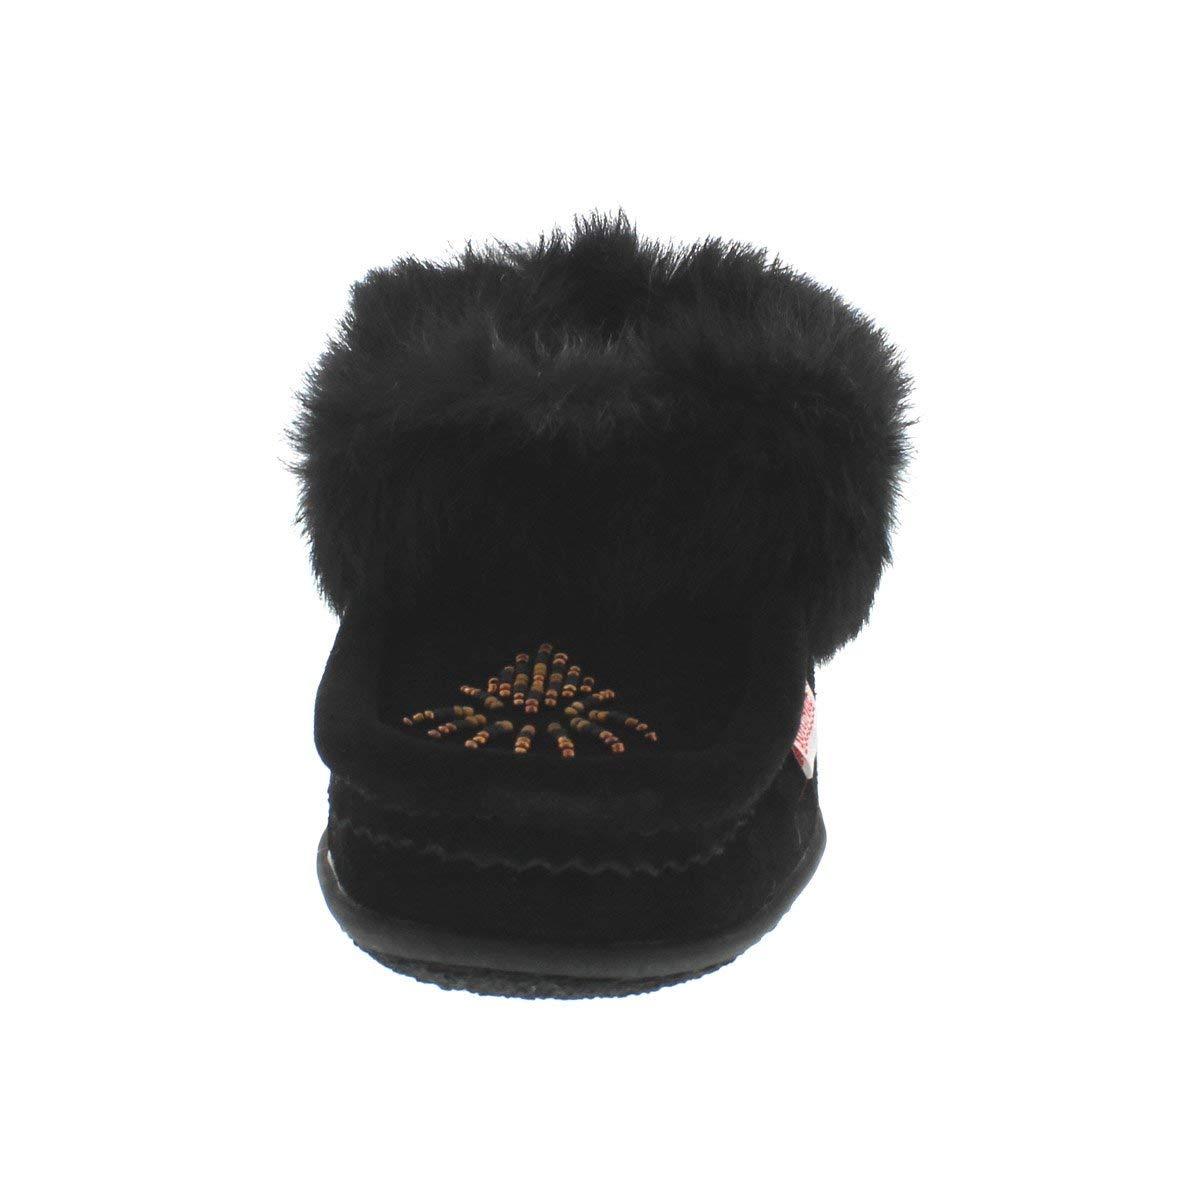 SoftMoc Womens Cute 4 Rabbit Fur Moccasin